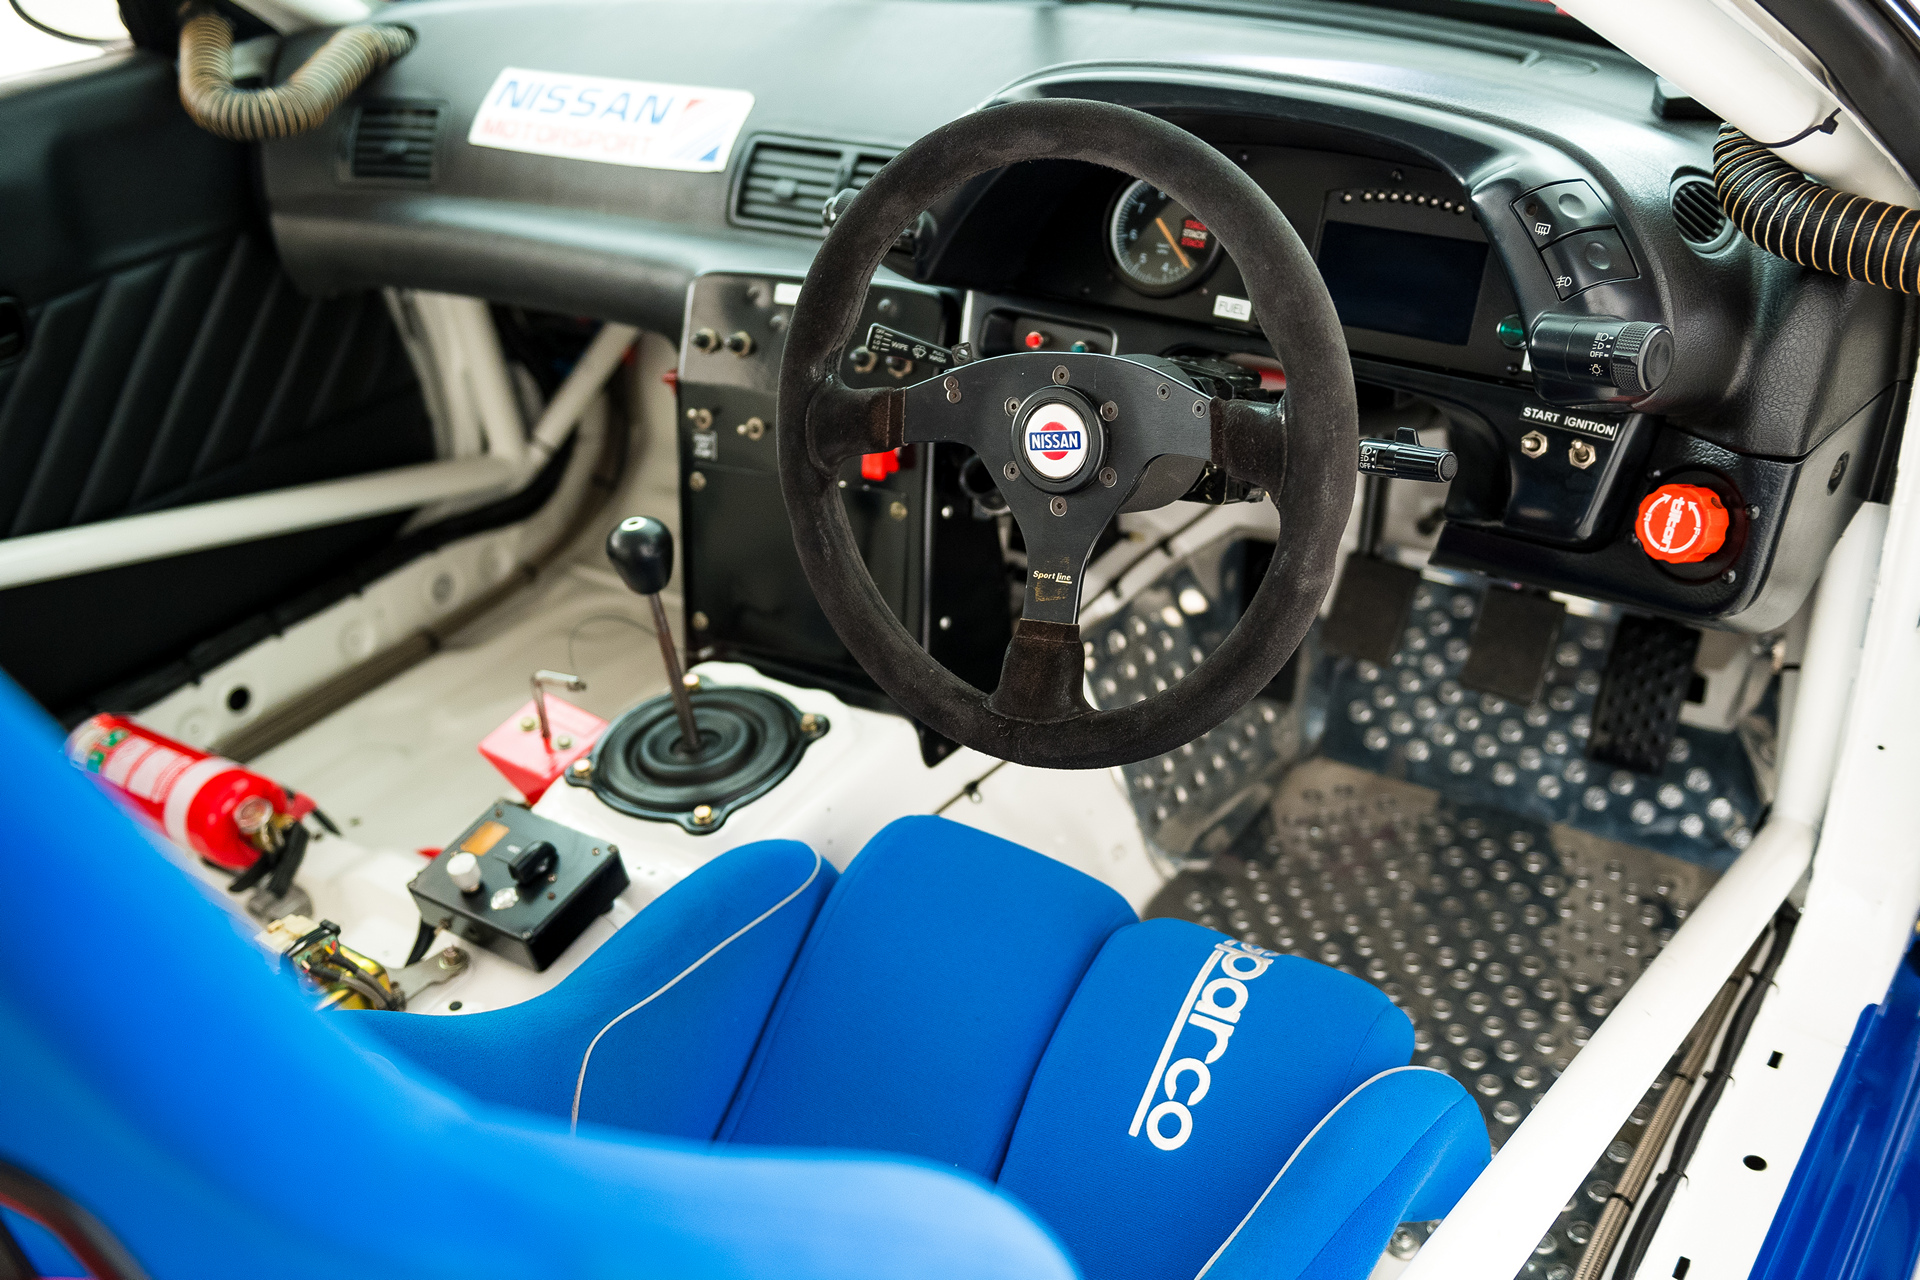 Nissan celebrates 25 years since first Bathurst 1000 victory © Nissan Motor Co., Ltd.